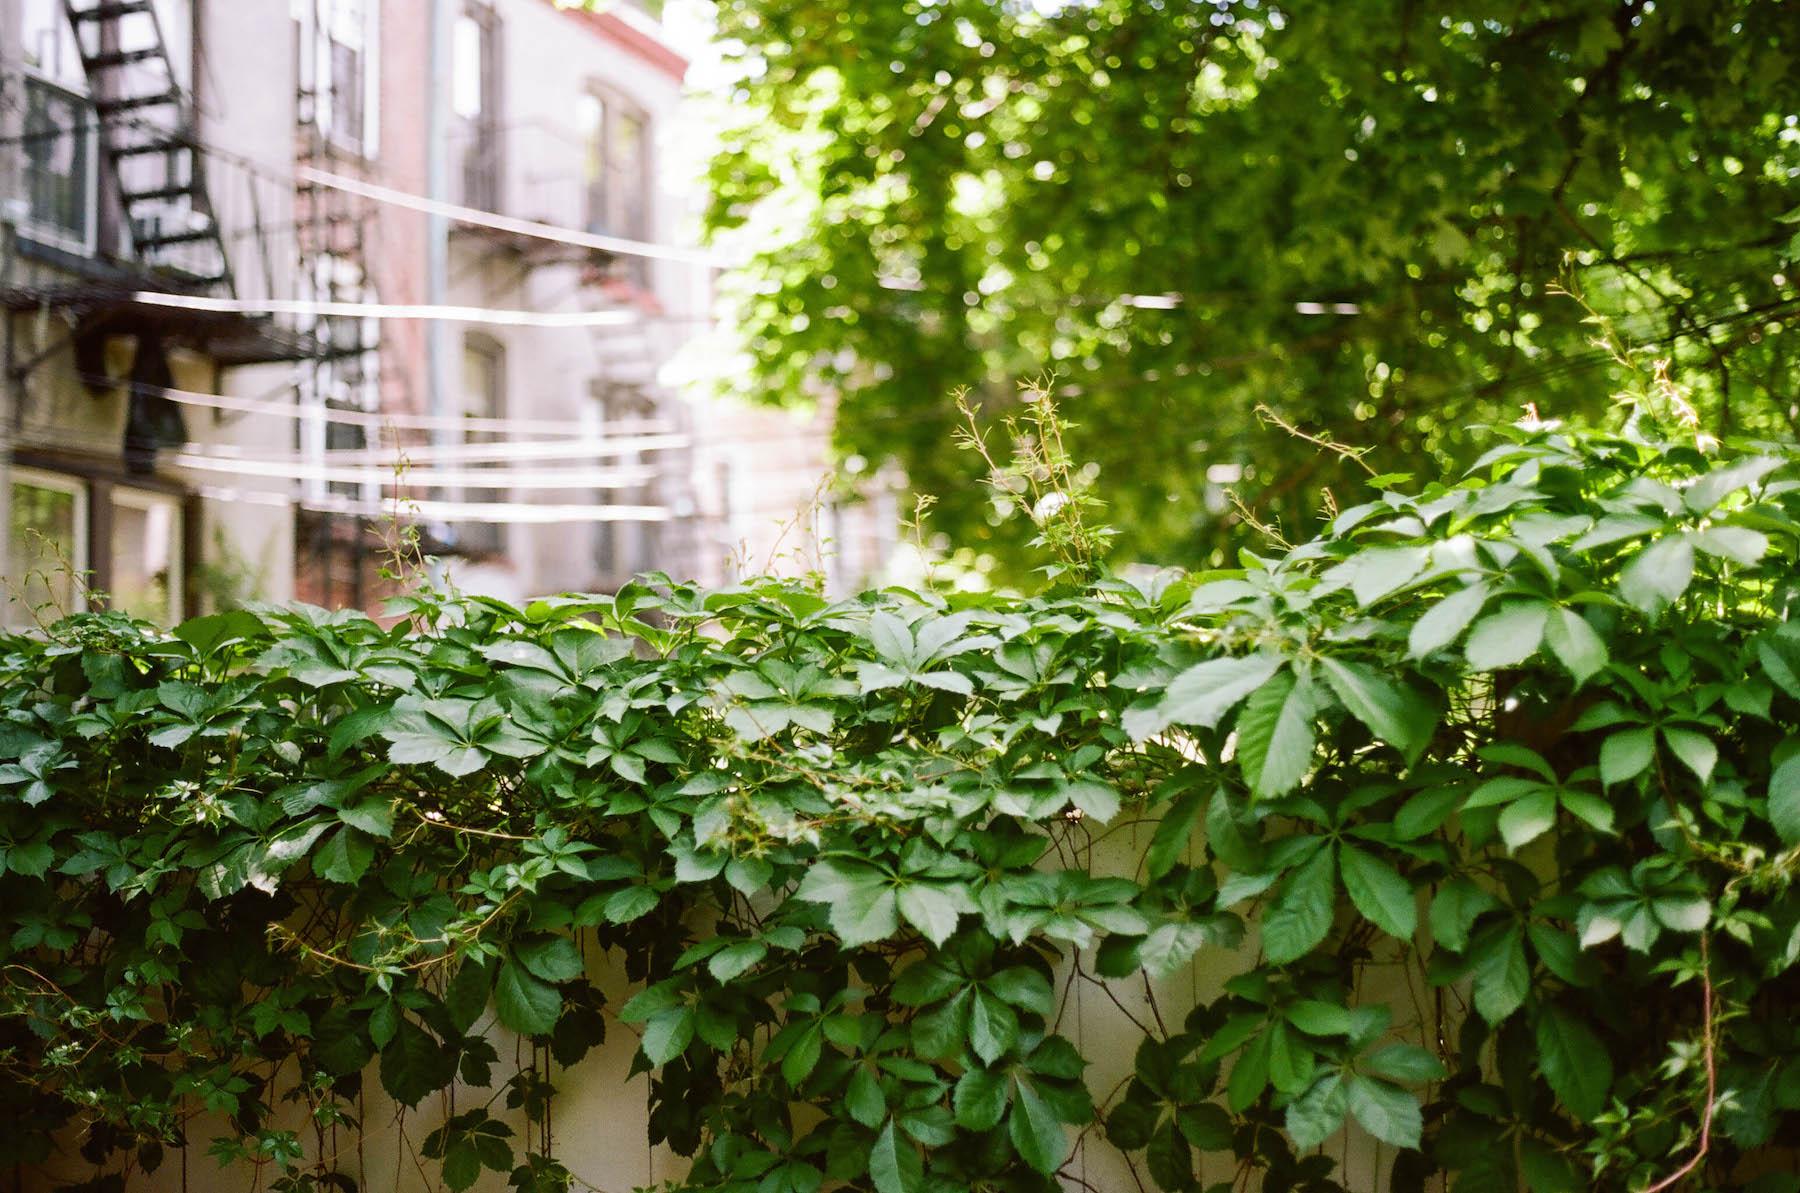 Brooklyn Backyard | Olympus OM1 and Zuiko 50mm f1.8 | Shawn Hoke